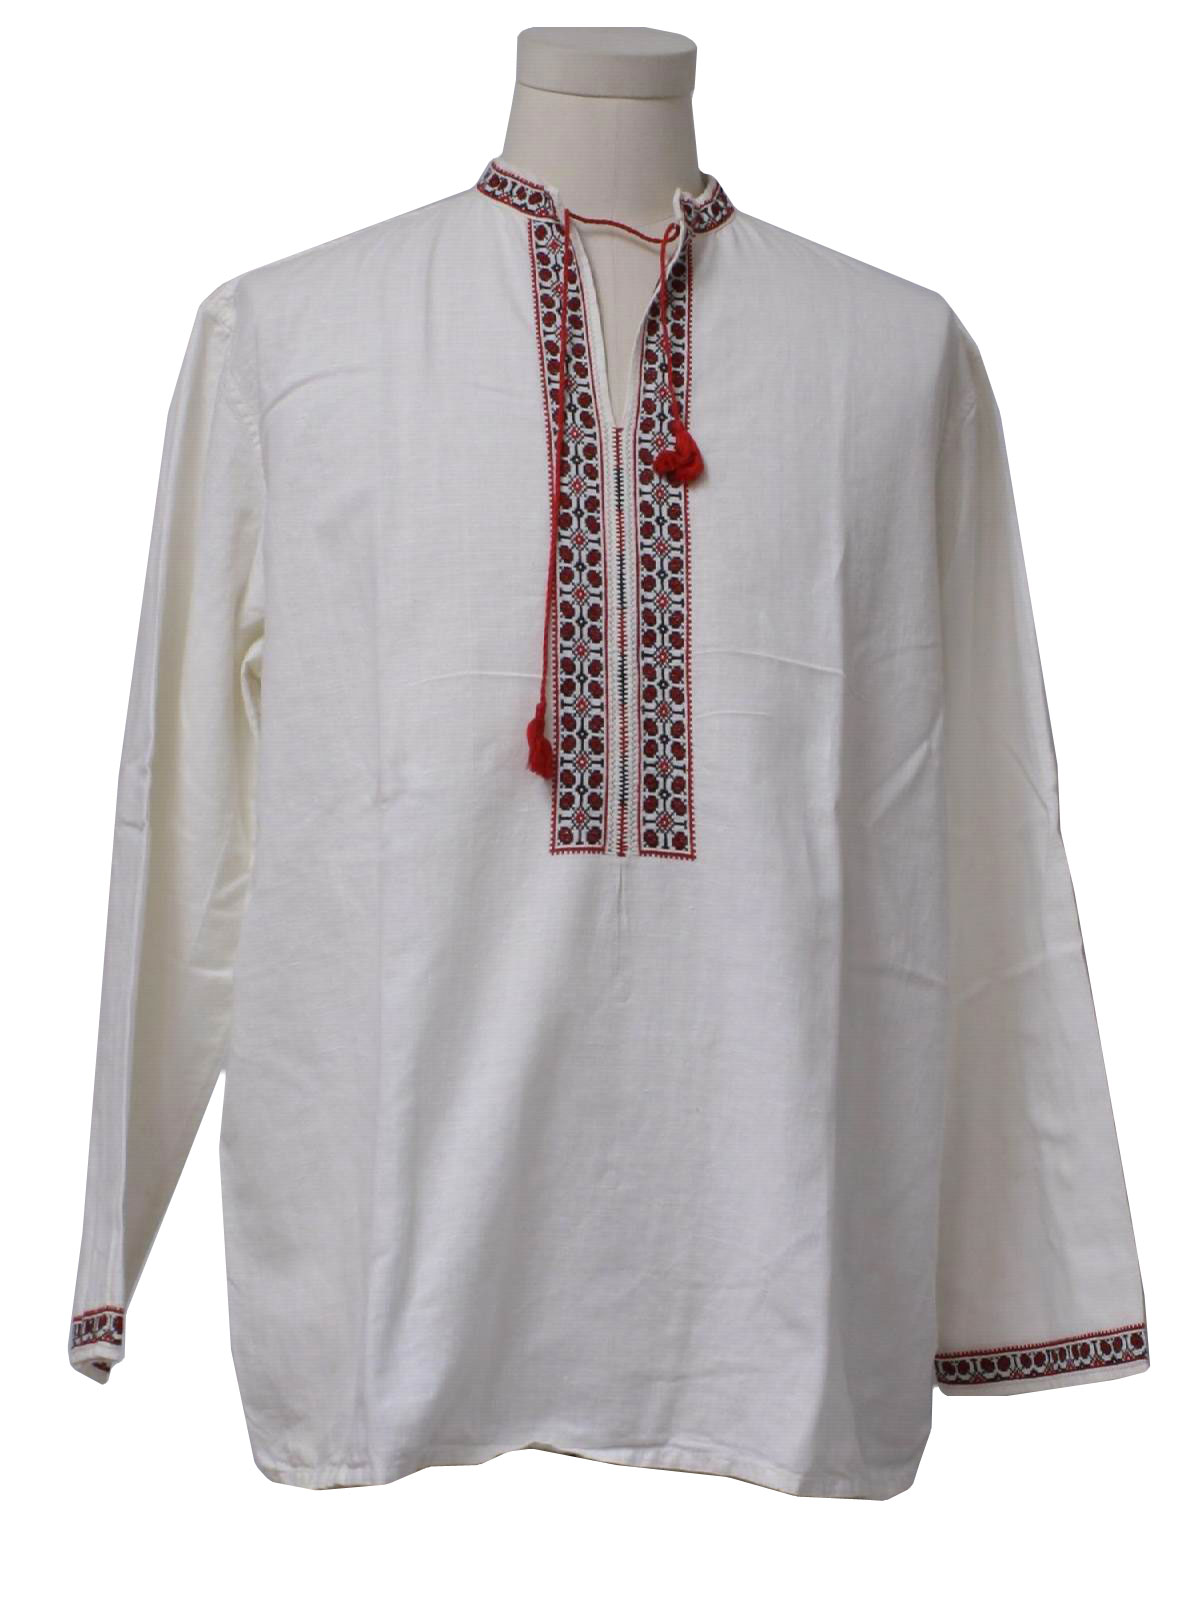 70 s vintage hippie shirt 70s missing label mens white